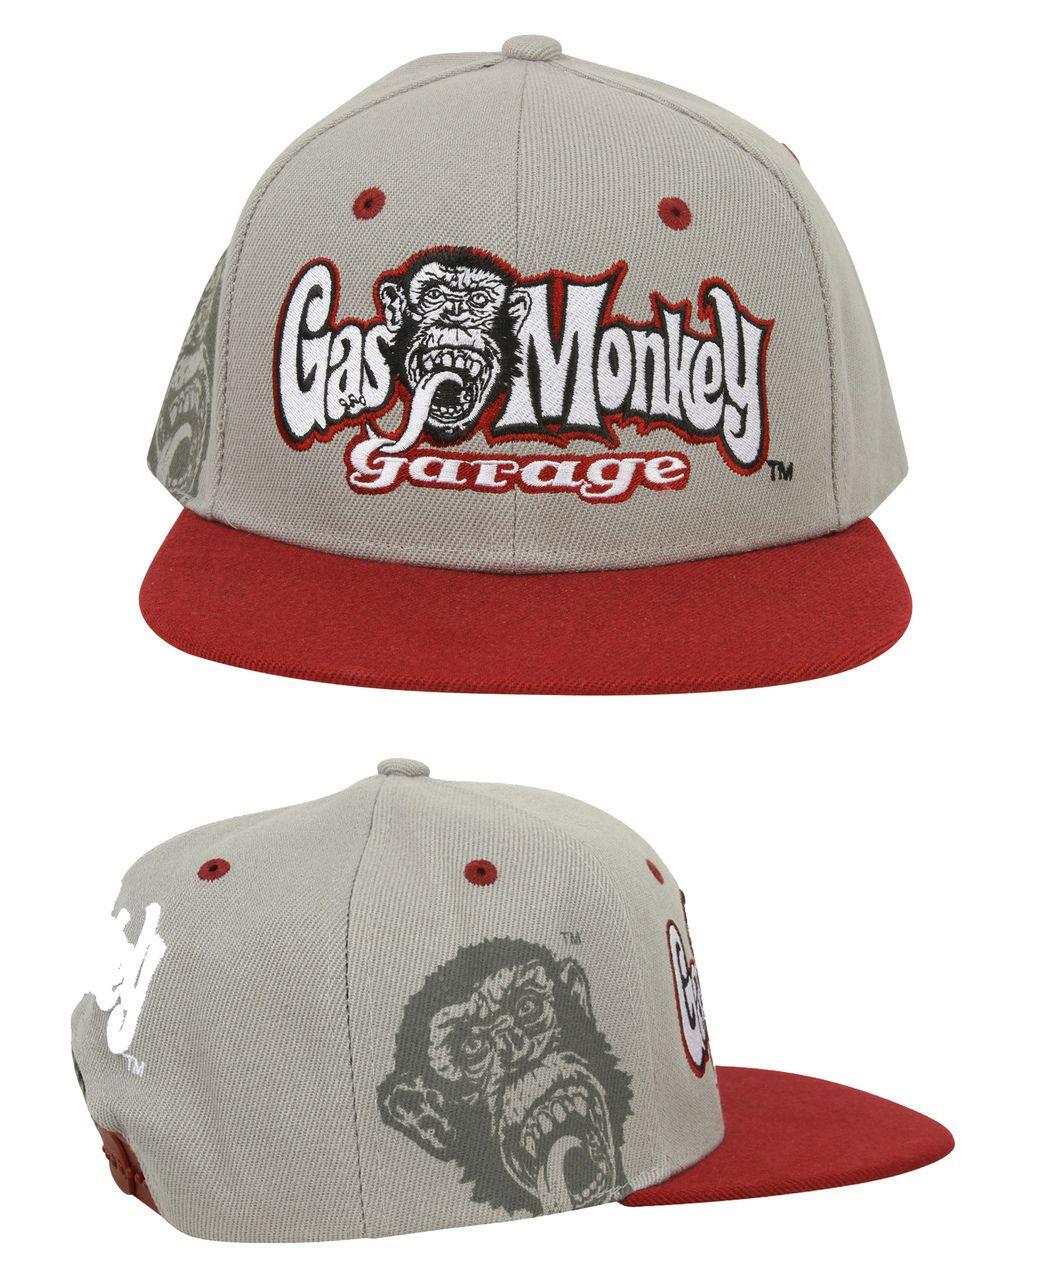 Rr Hands Gas Monkey Garage Snap Back Cap Grey Rr Hands Grey Snap Back Cap With Contrasting Burgundy Peak And Embroid Gas Monkey Snap Backs Gas Monkey Garage